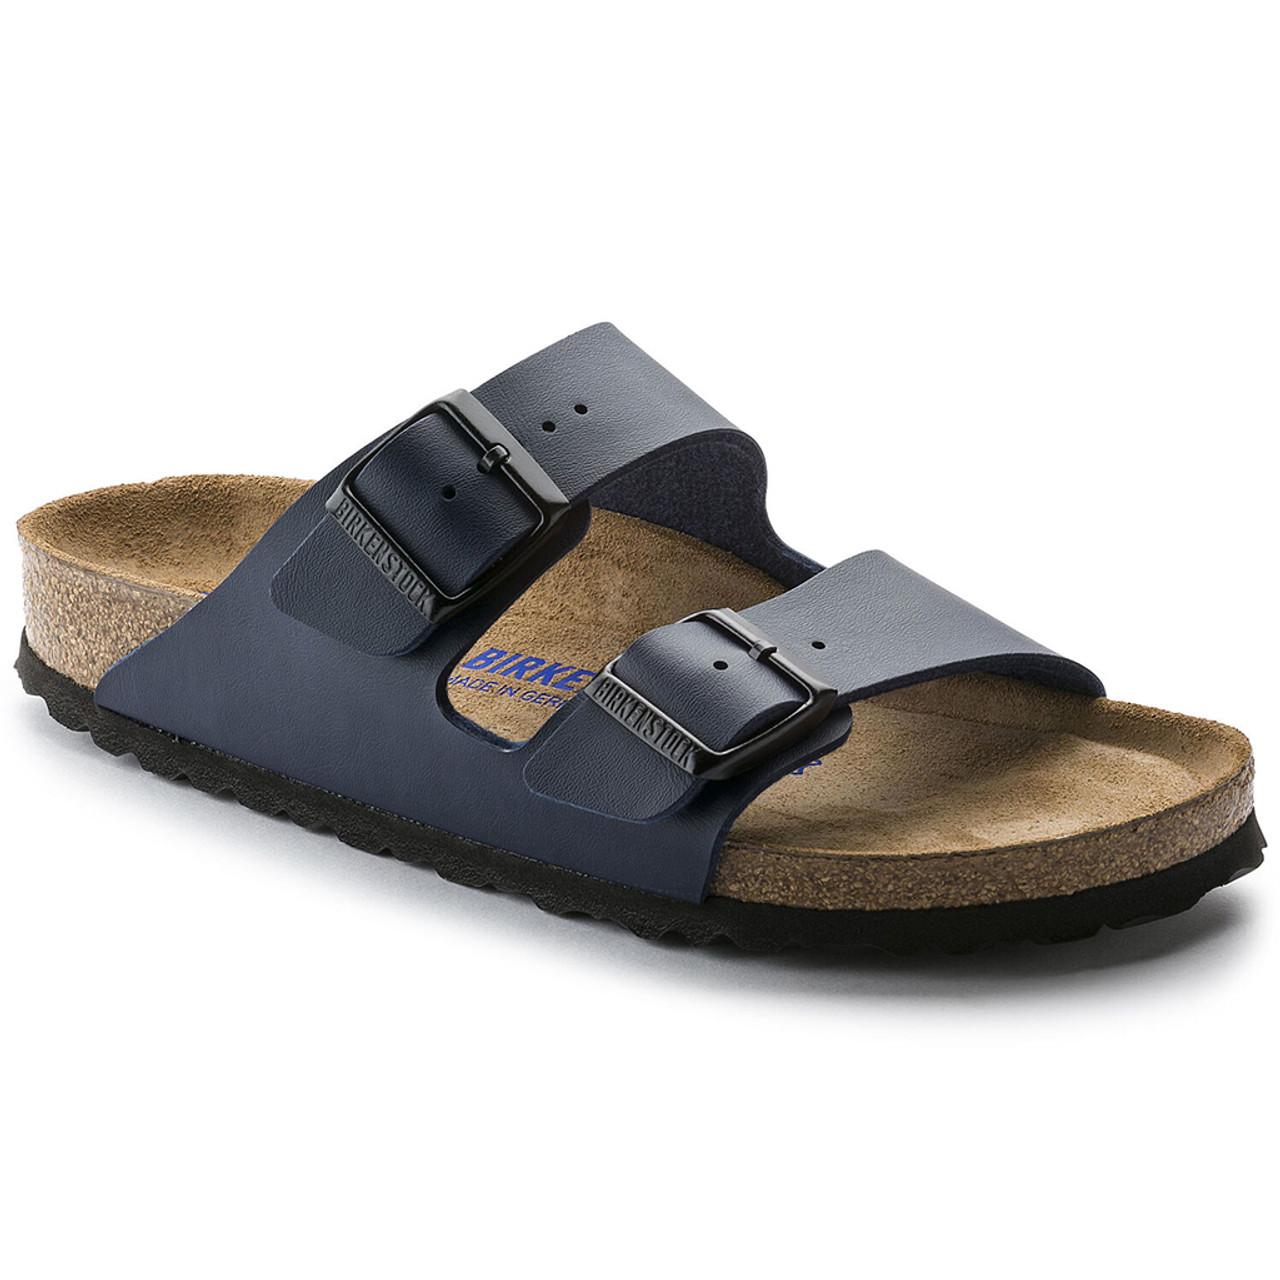 Birkenstock - Arizona Sandal - Soft